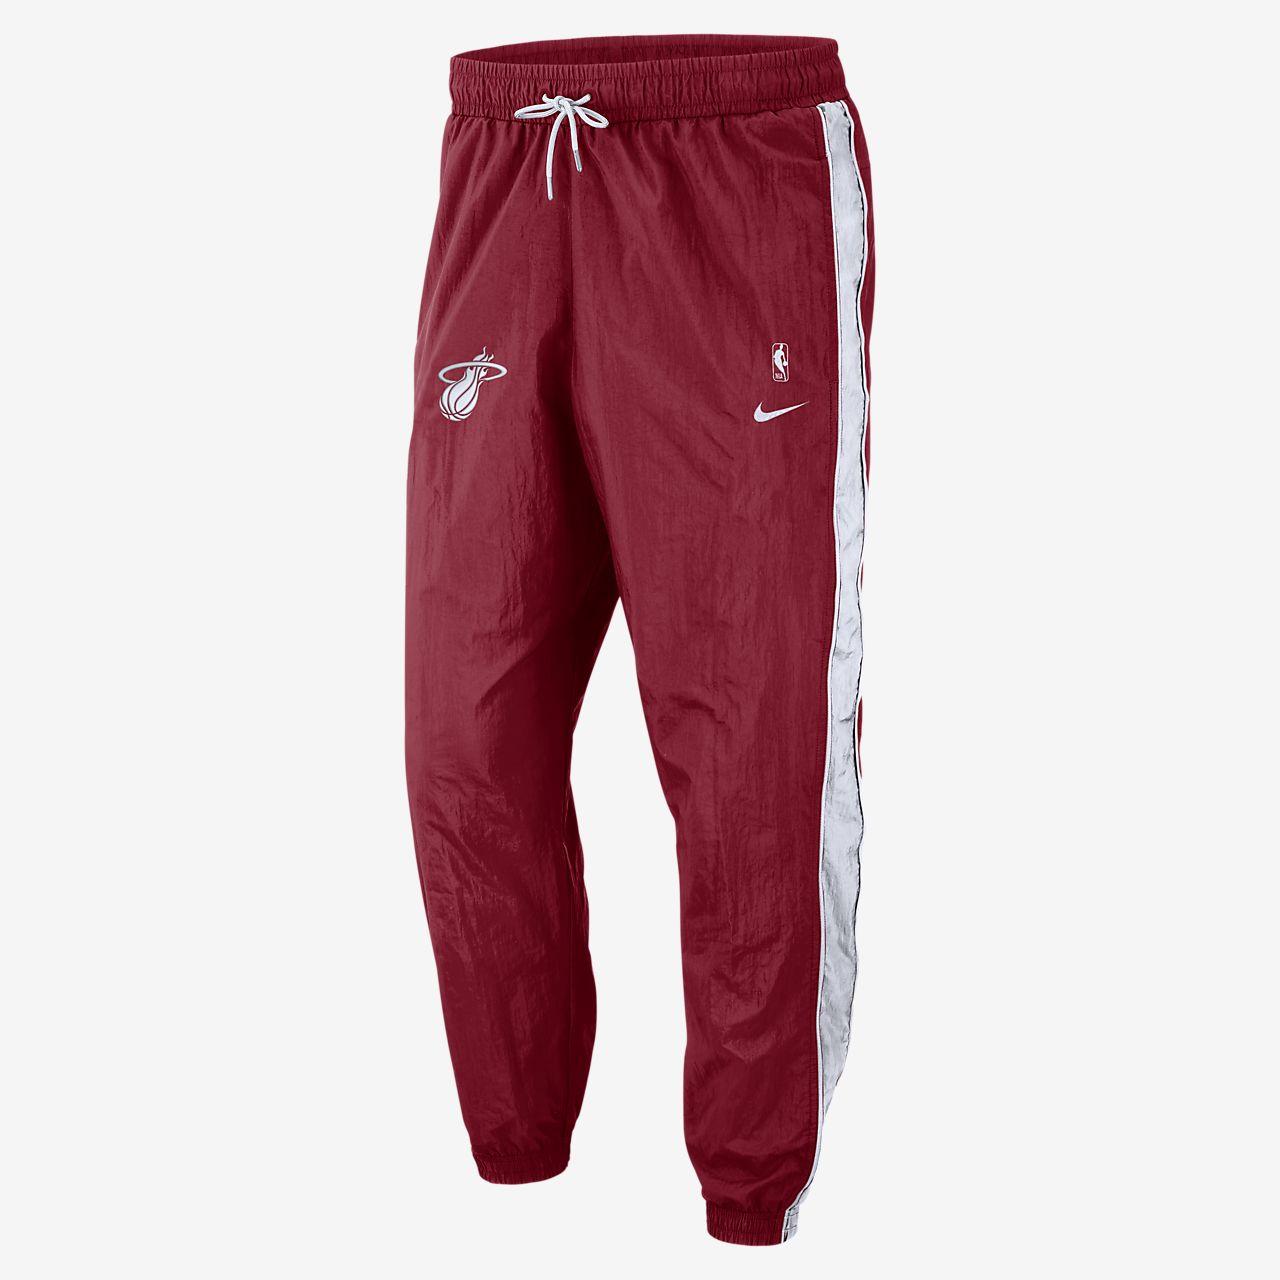 cdf48b75d2f39b Miami Heat Nike Men s NBA Tracksuit Pants. Nike.com